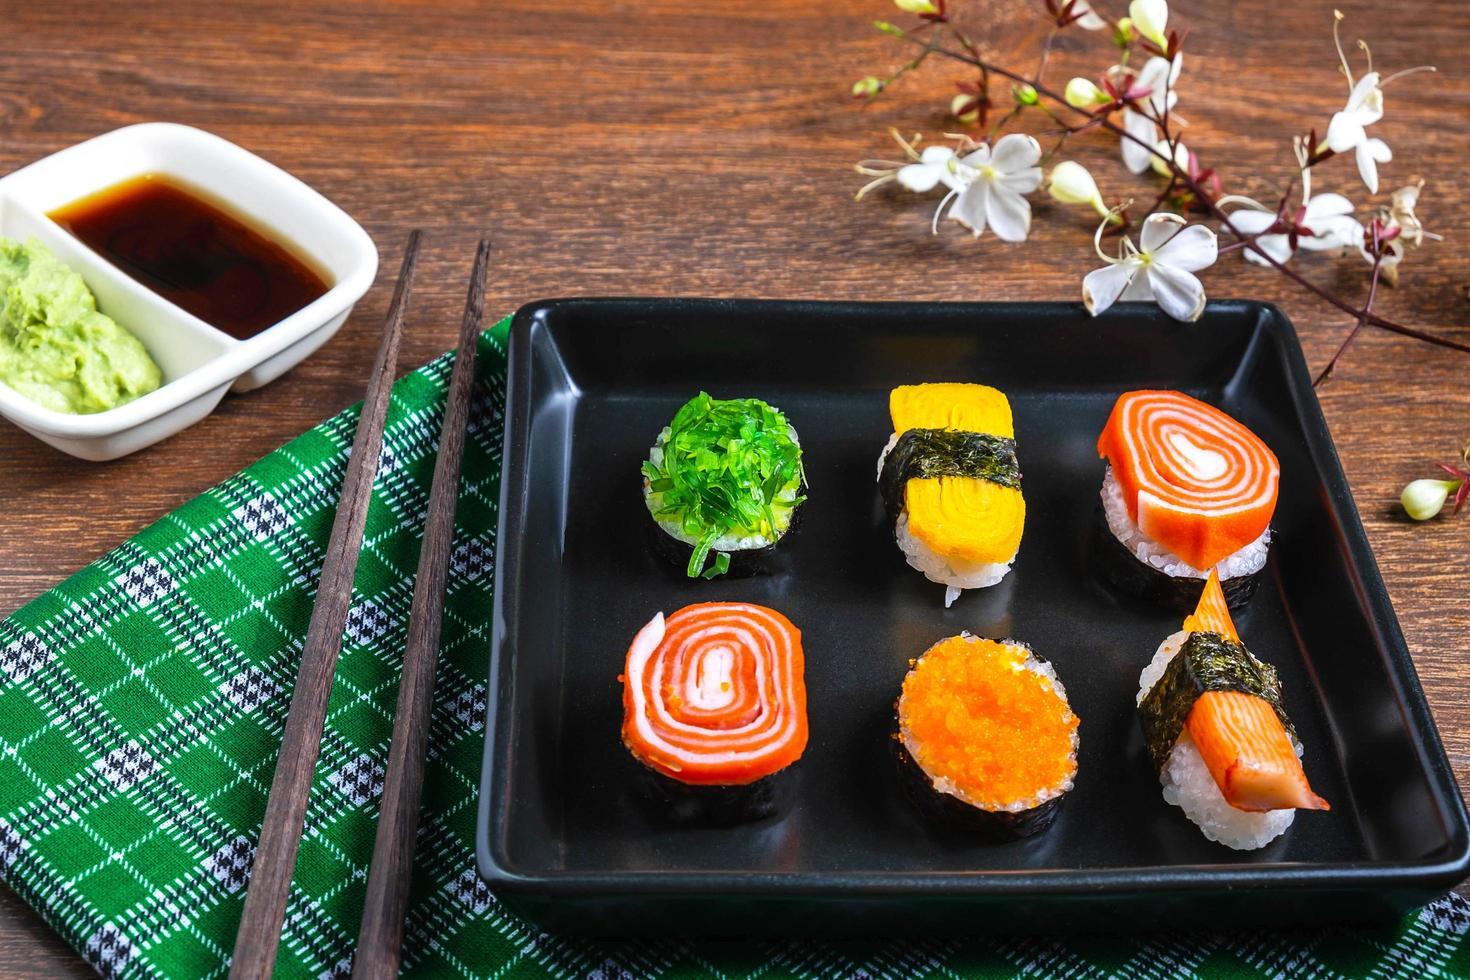 plato de sushi con salsa para mojar foto